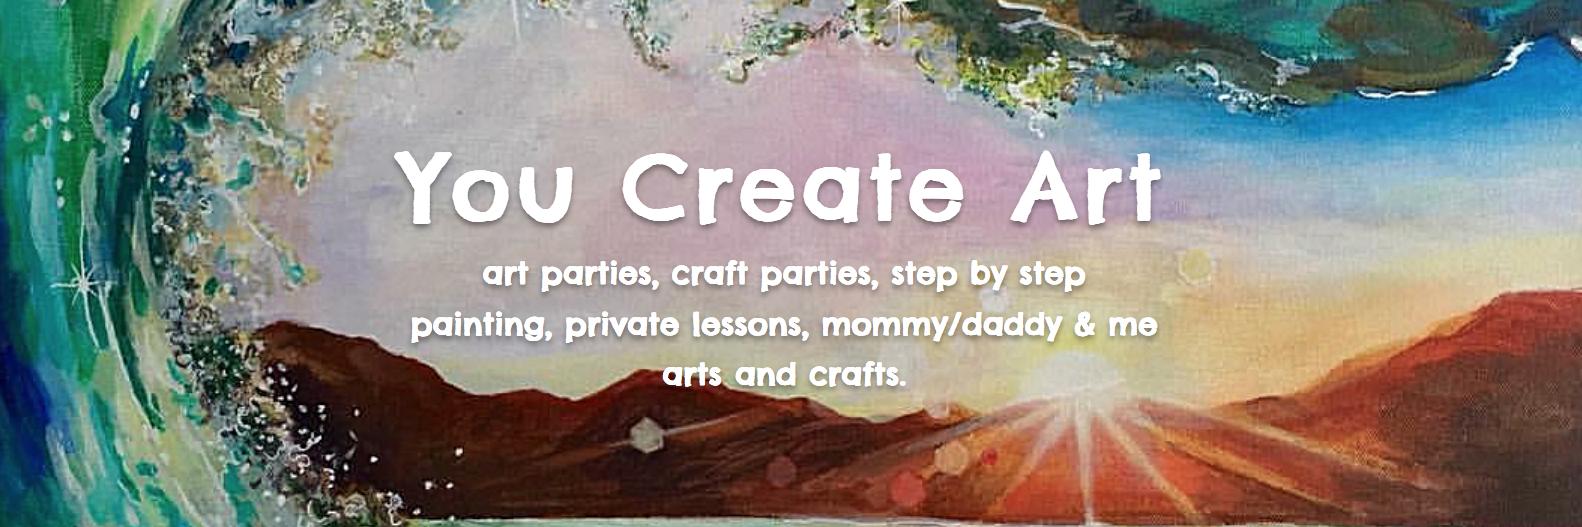 you create art